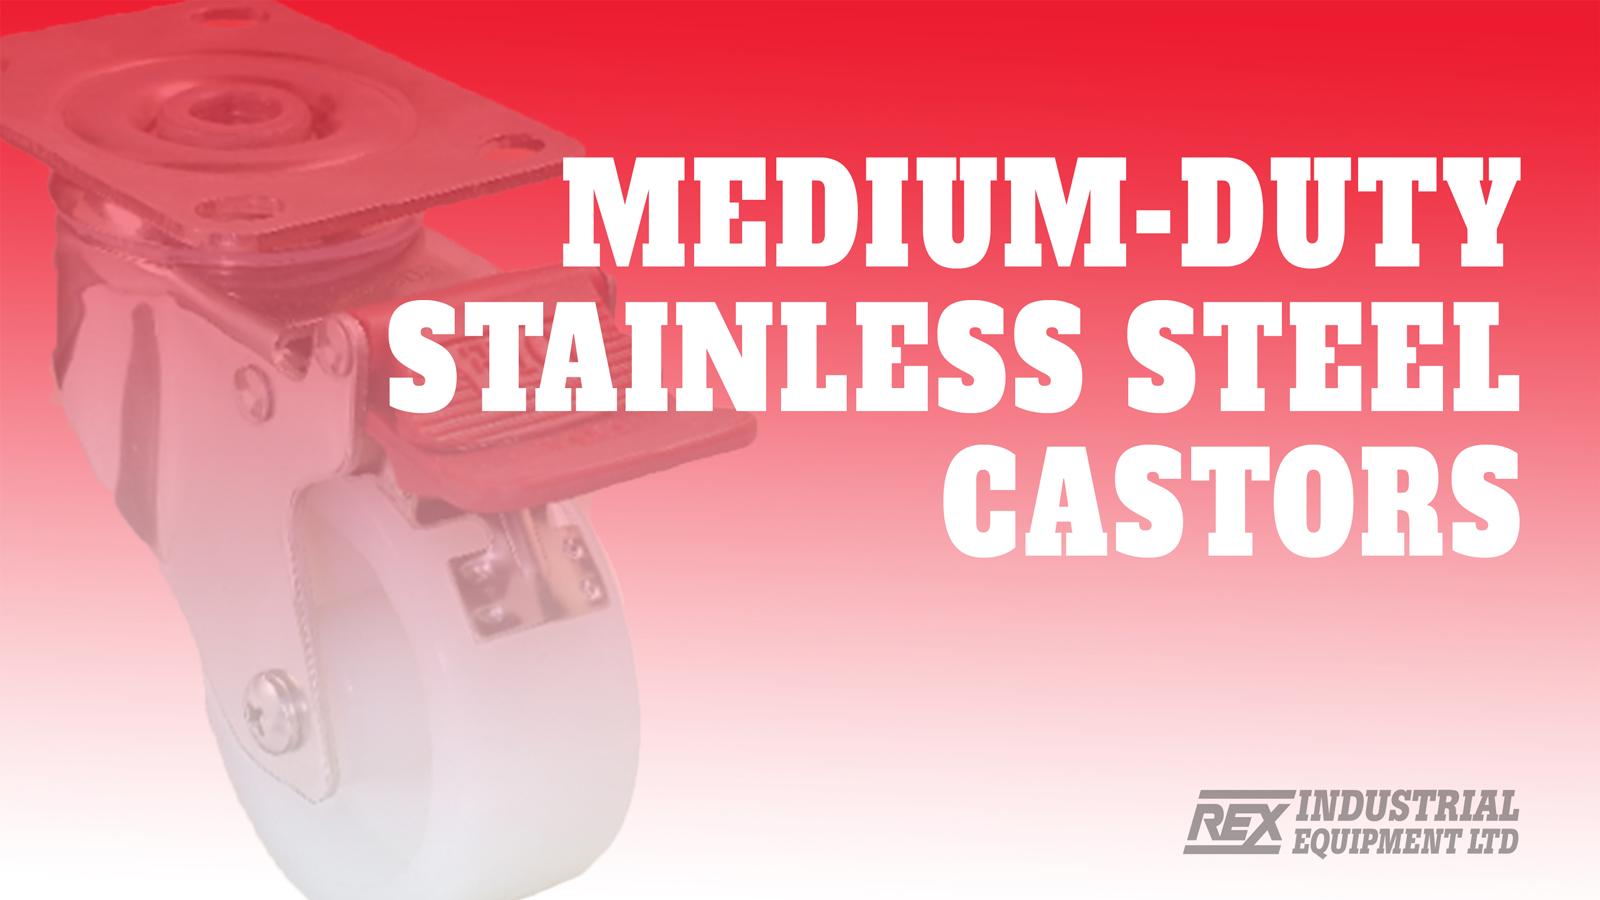 Medium-Duty-Stainless-Steel-Castors-Banner-1600-x-900